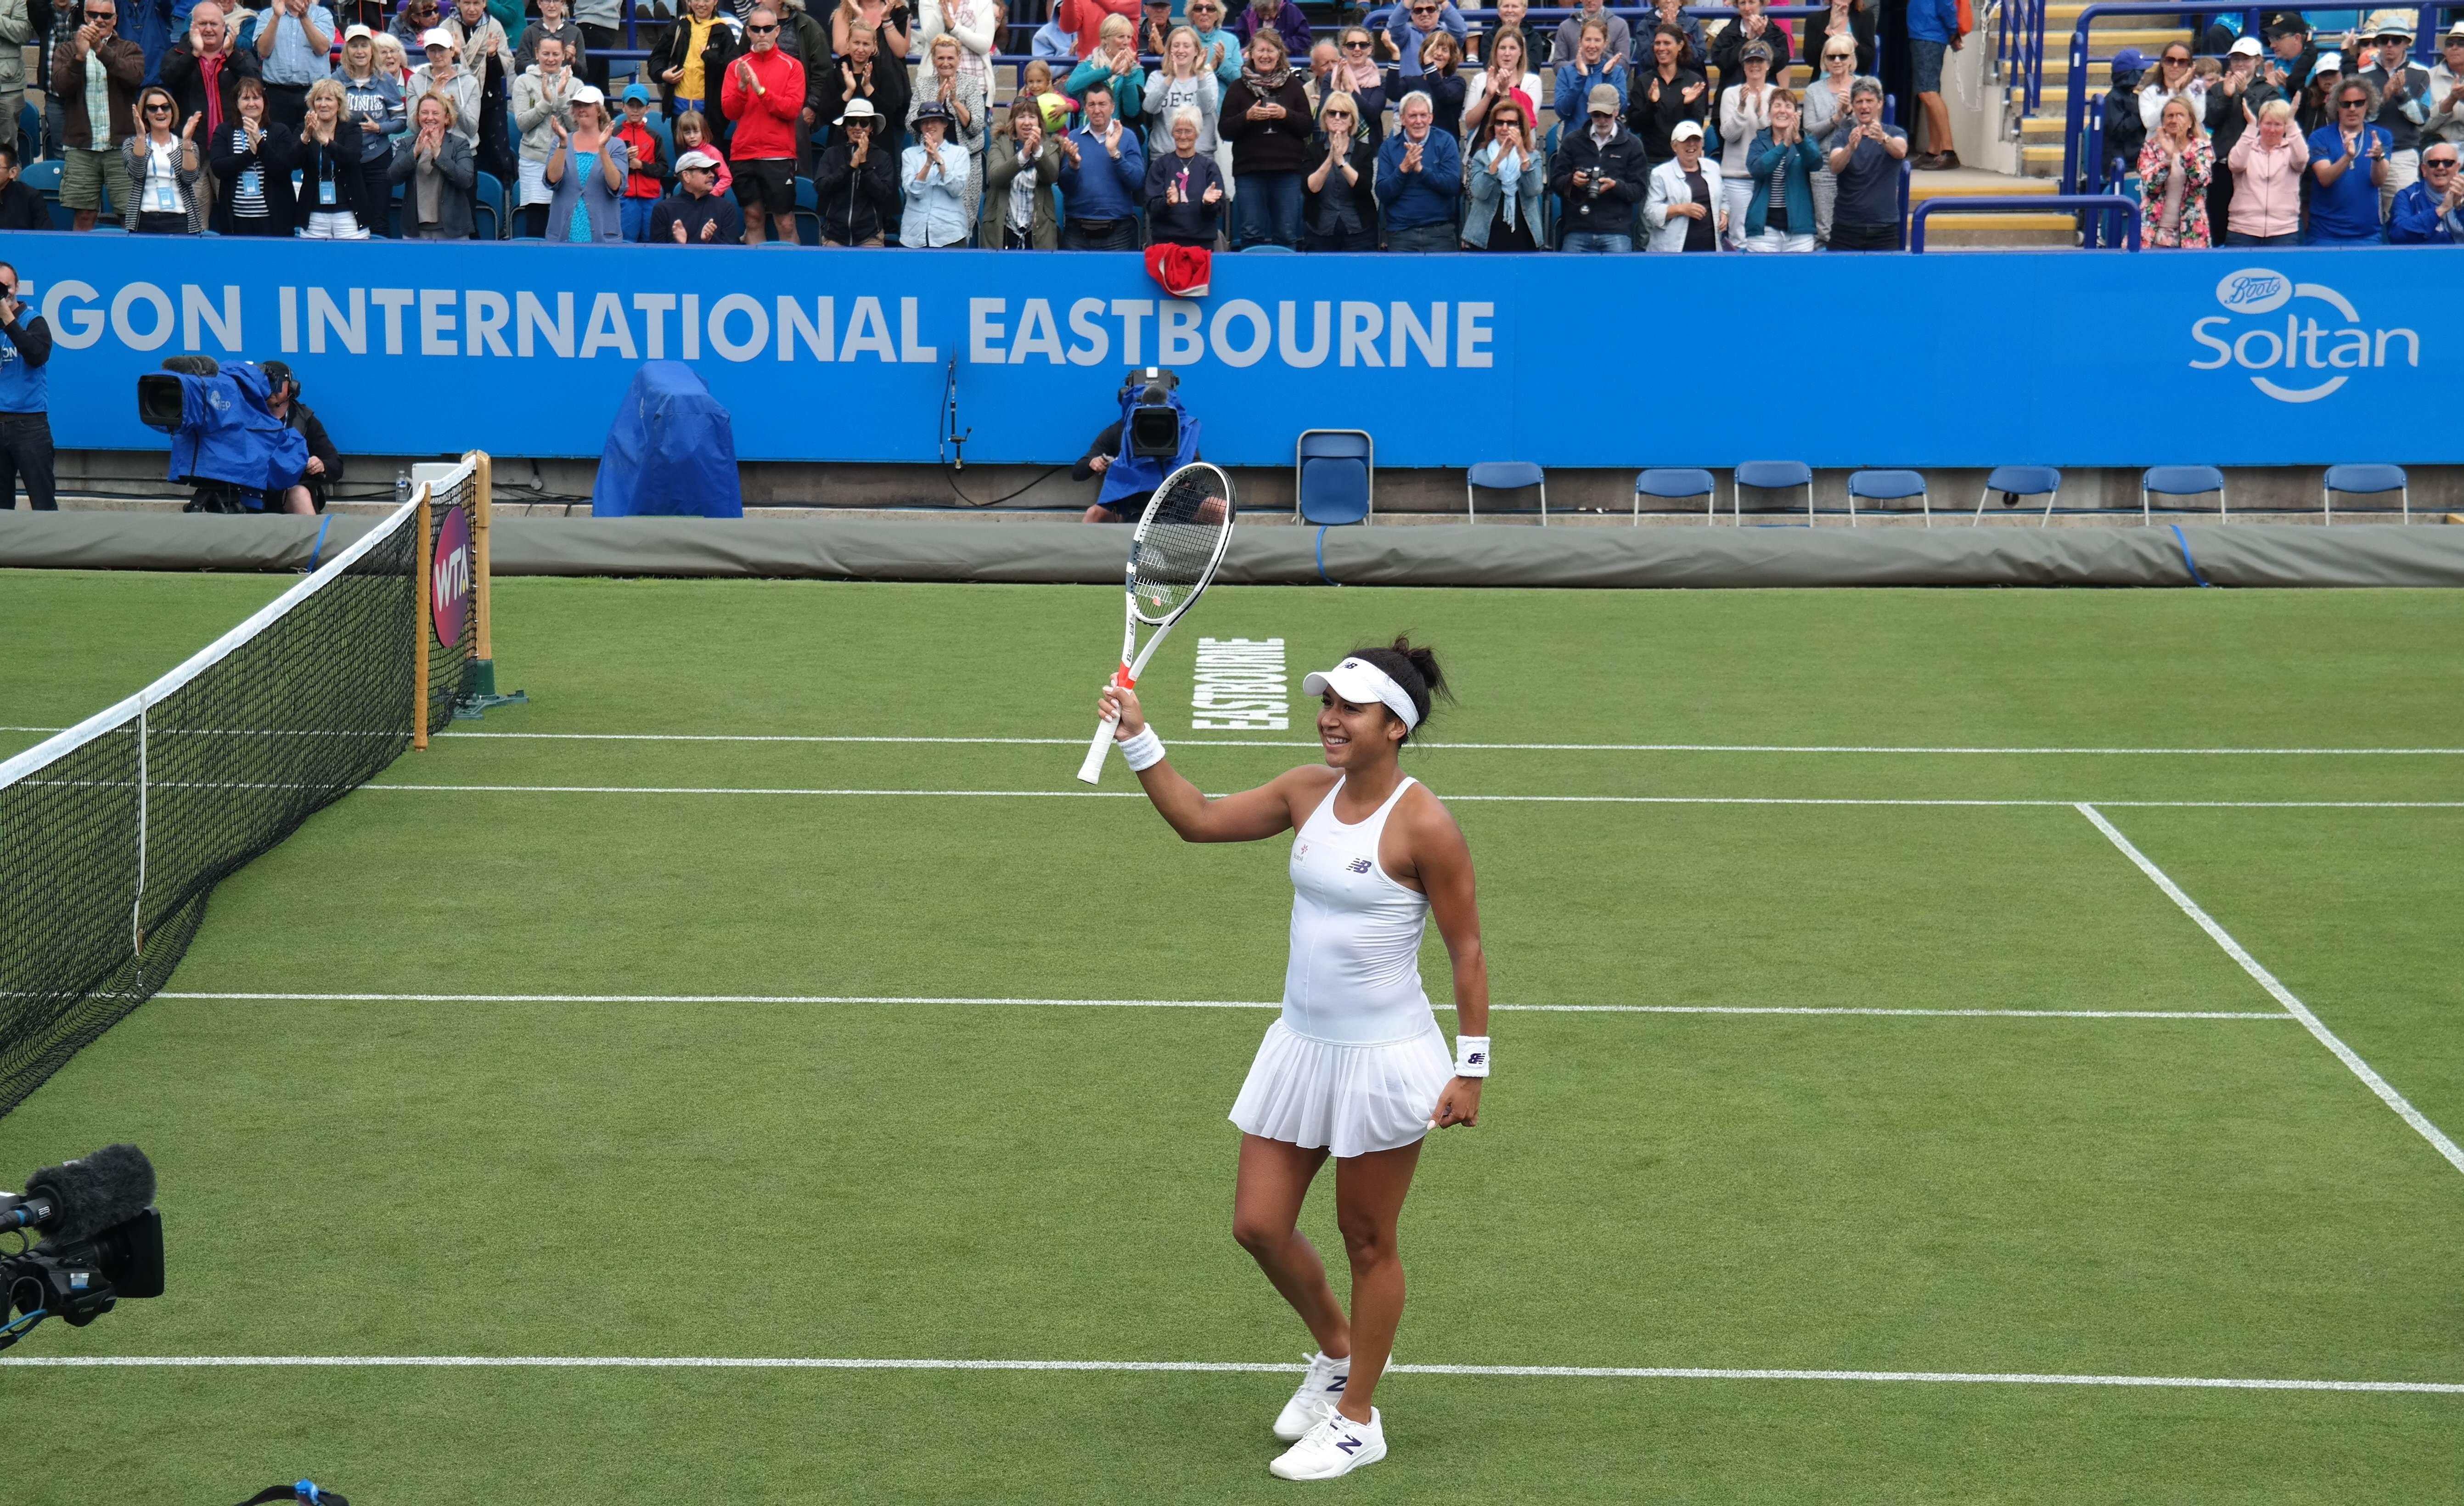 Heather Watson winning at Eastbourne